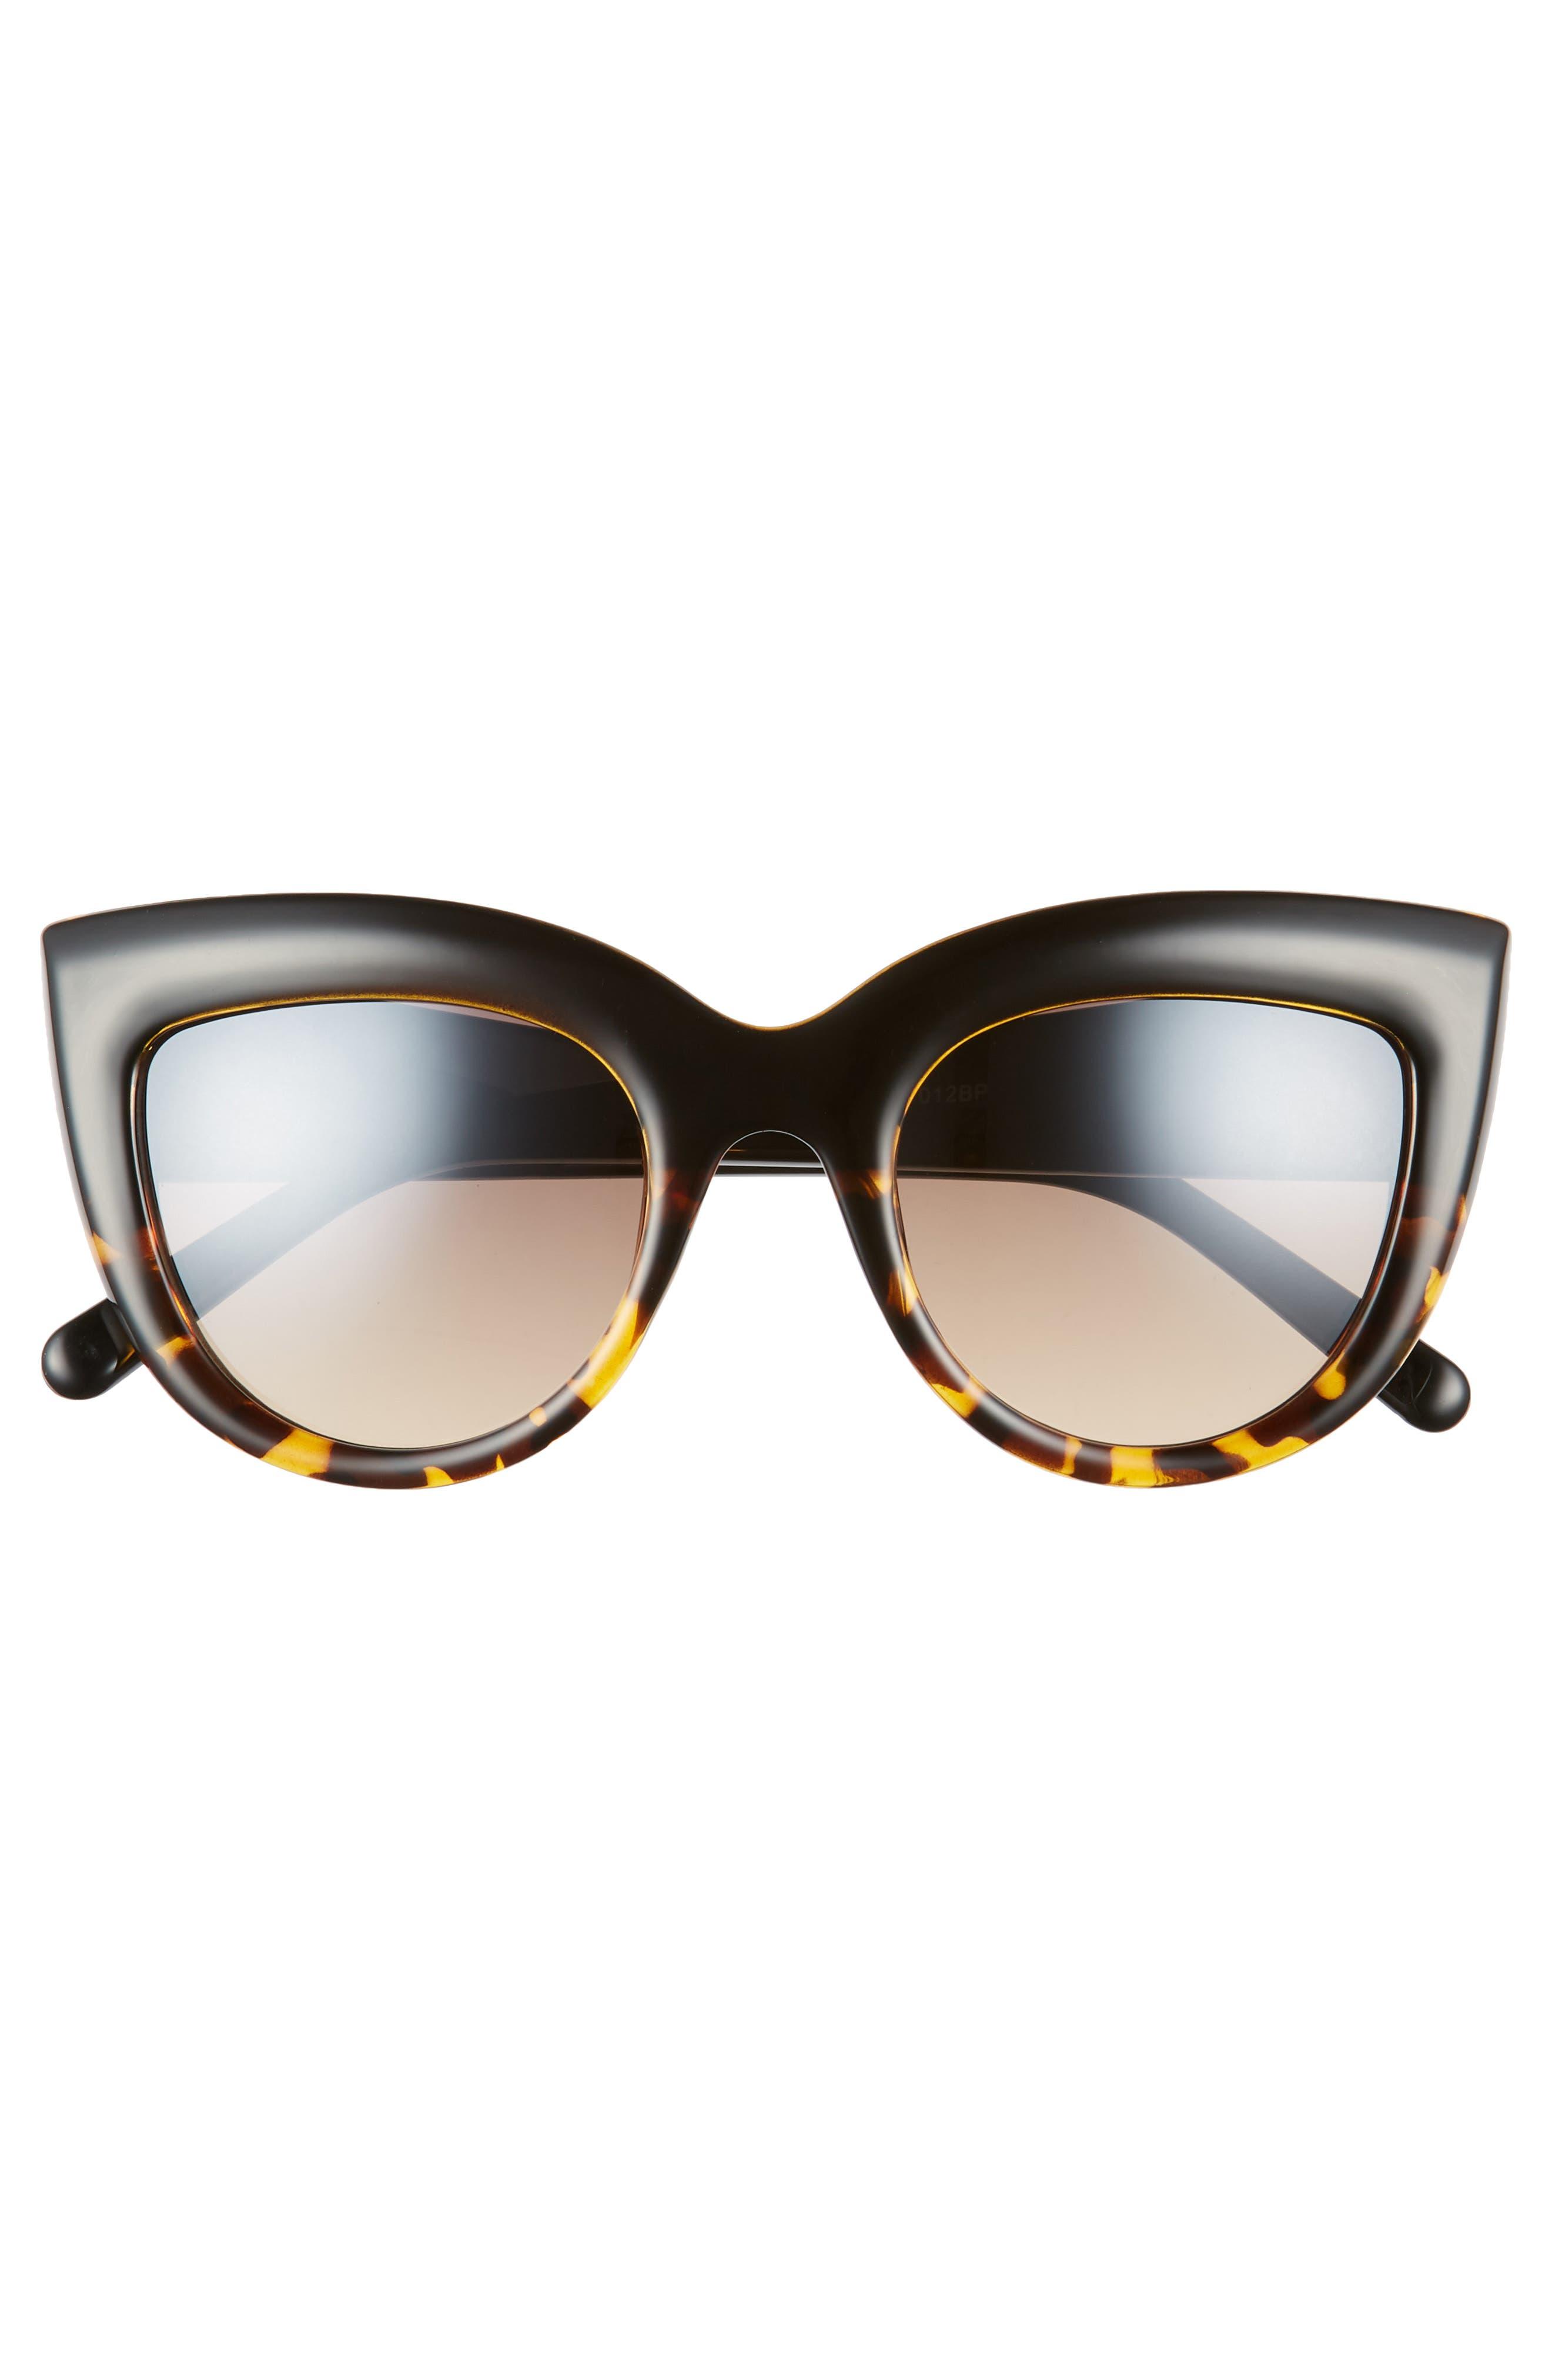 60mm Two-Tone Cat Eye Sunglasses,                             Alternate thumbnail 3, color,                             Black/ Tort